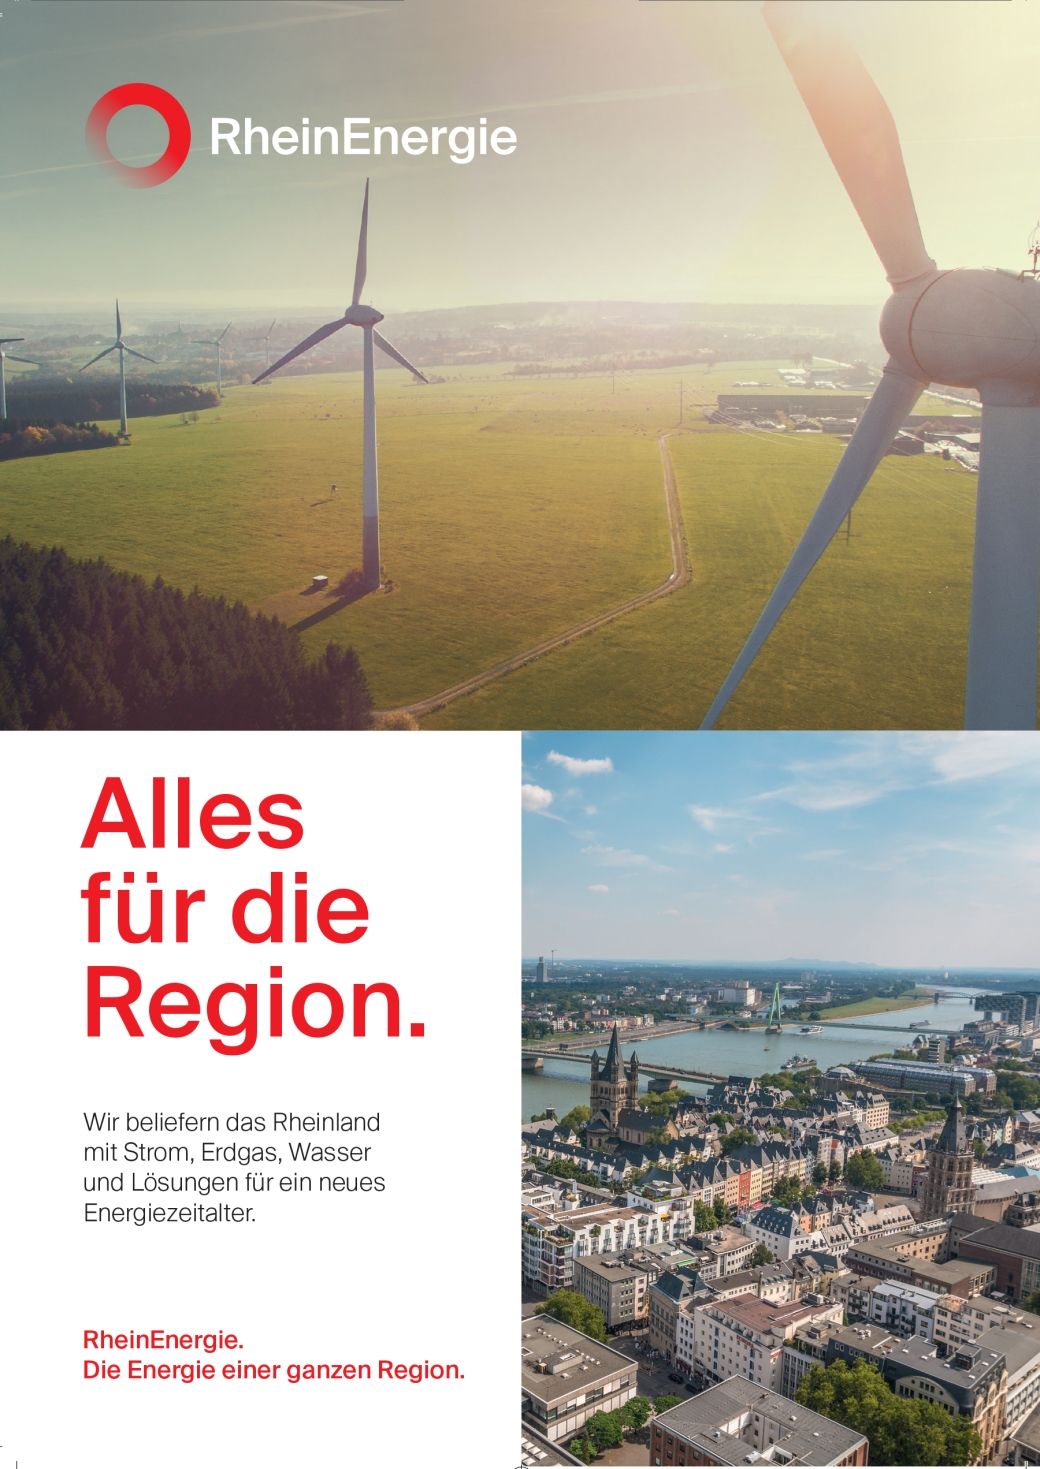 RHE_Imageanzeige_Region_A5_AS